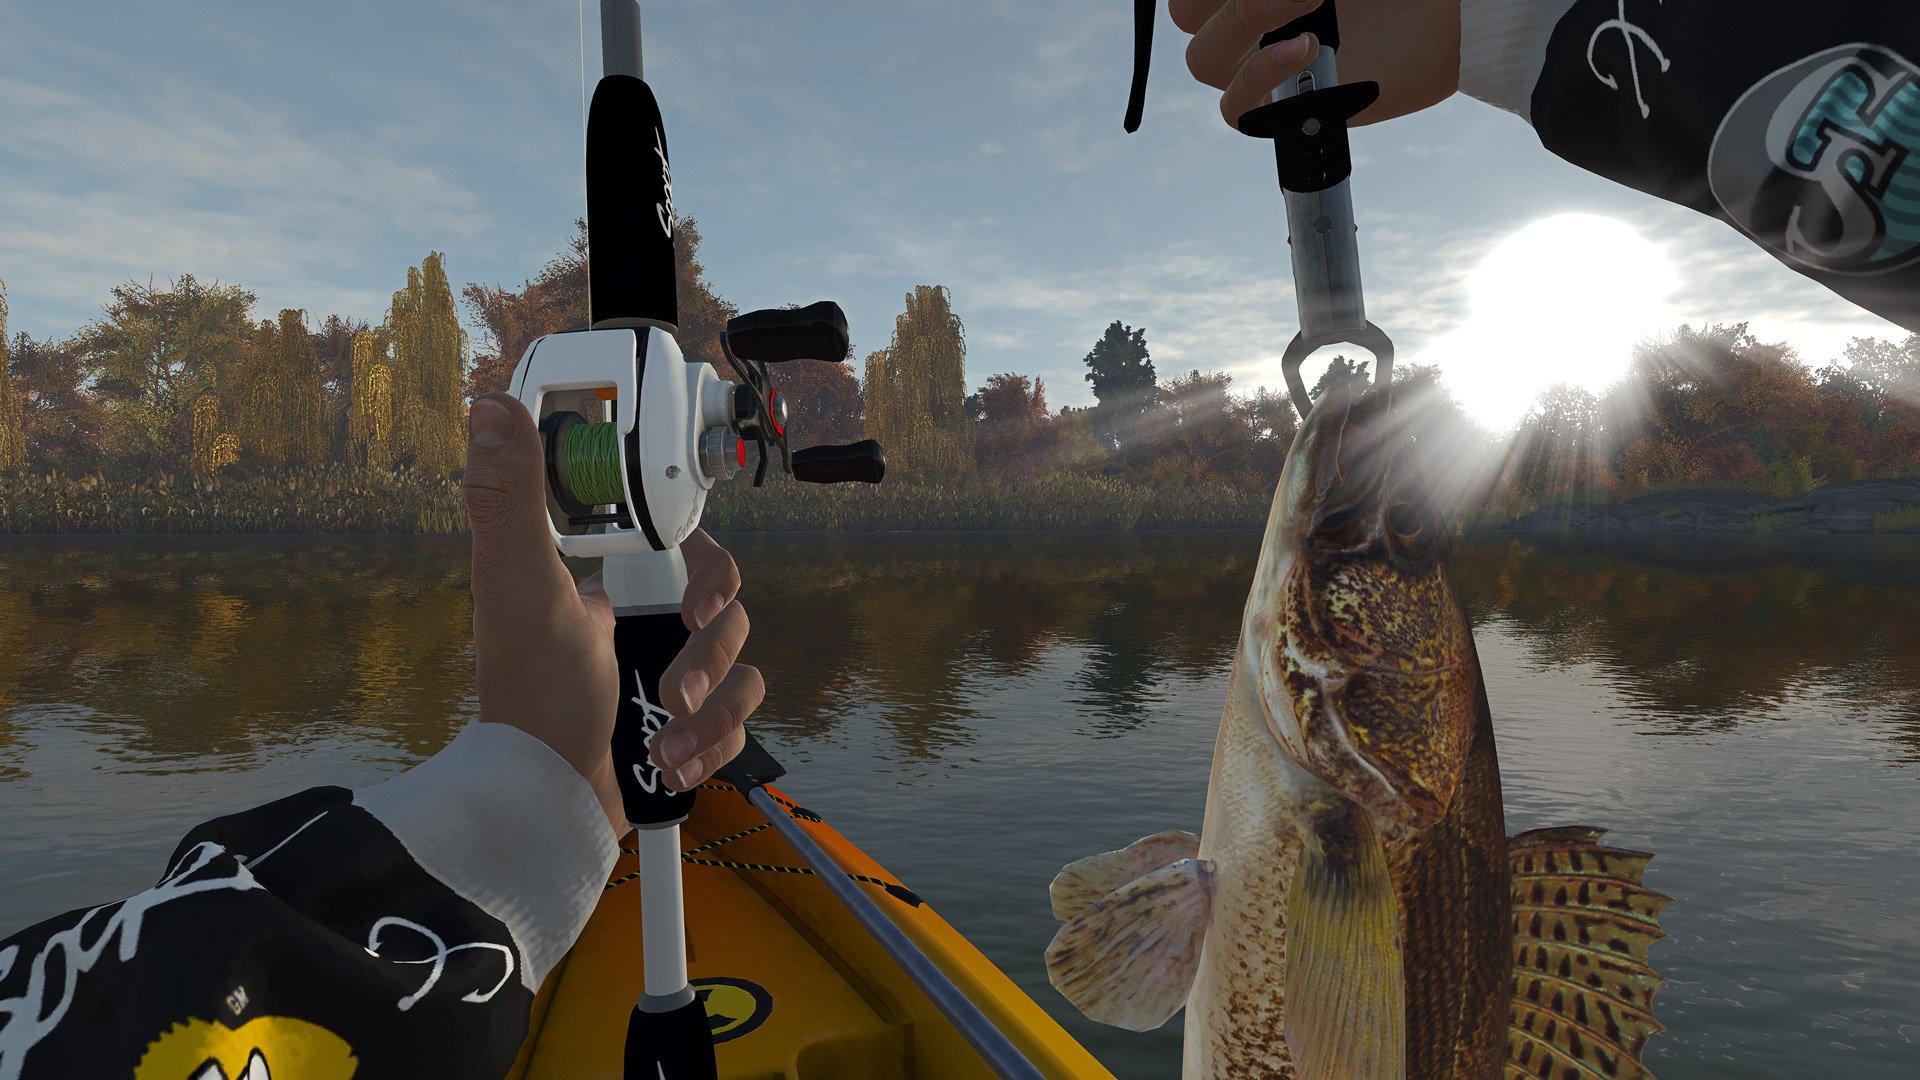 migliori MMO gratis 2020 migliori MMORPG gratis 2020 fishing planet